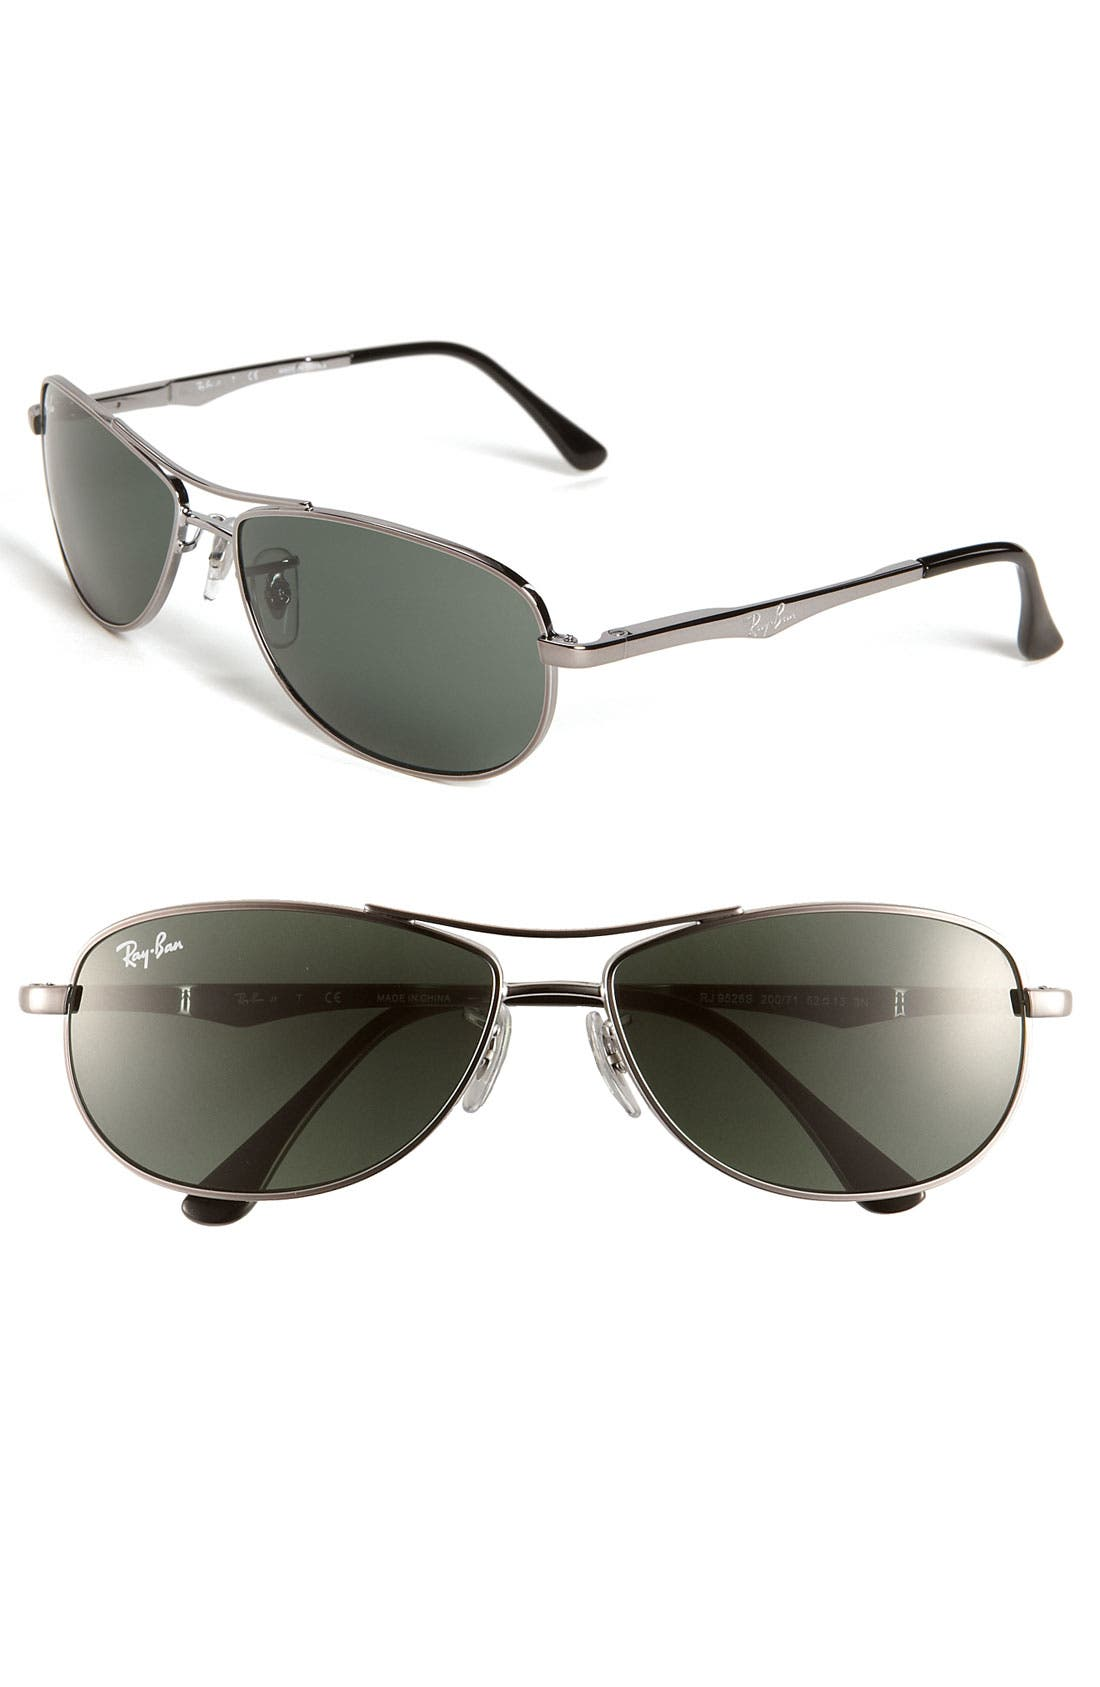 Main Image - Ray-Ban 'Morphed' Aviator 52mm Sunglasses (Big Boys)